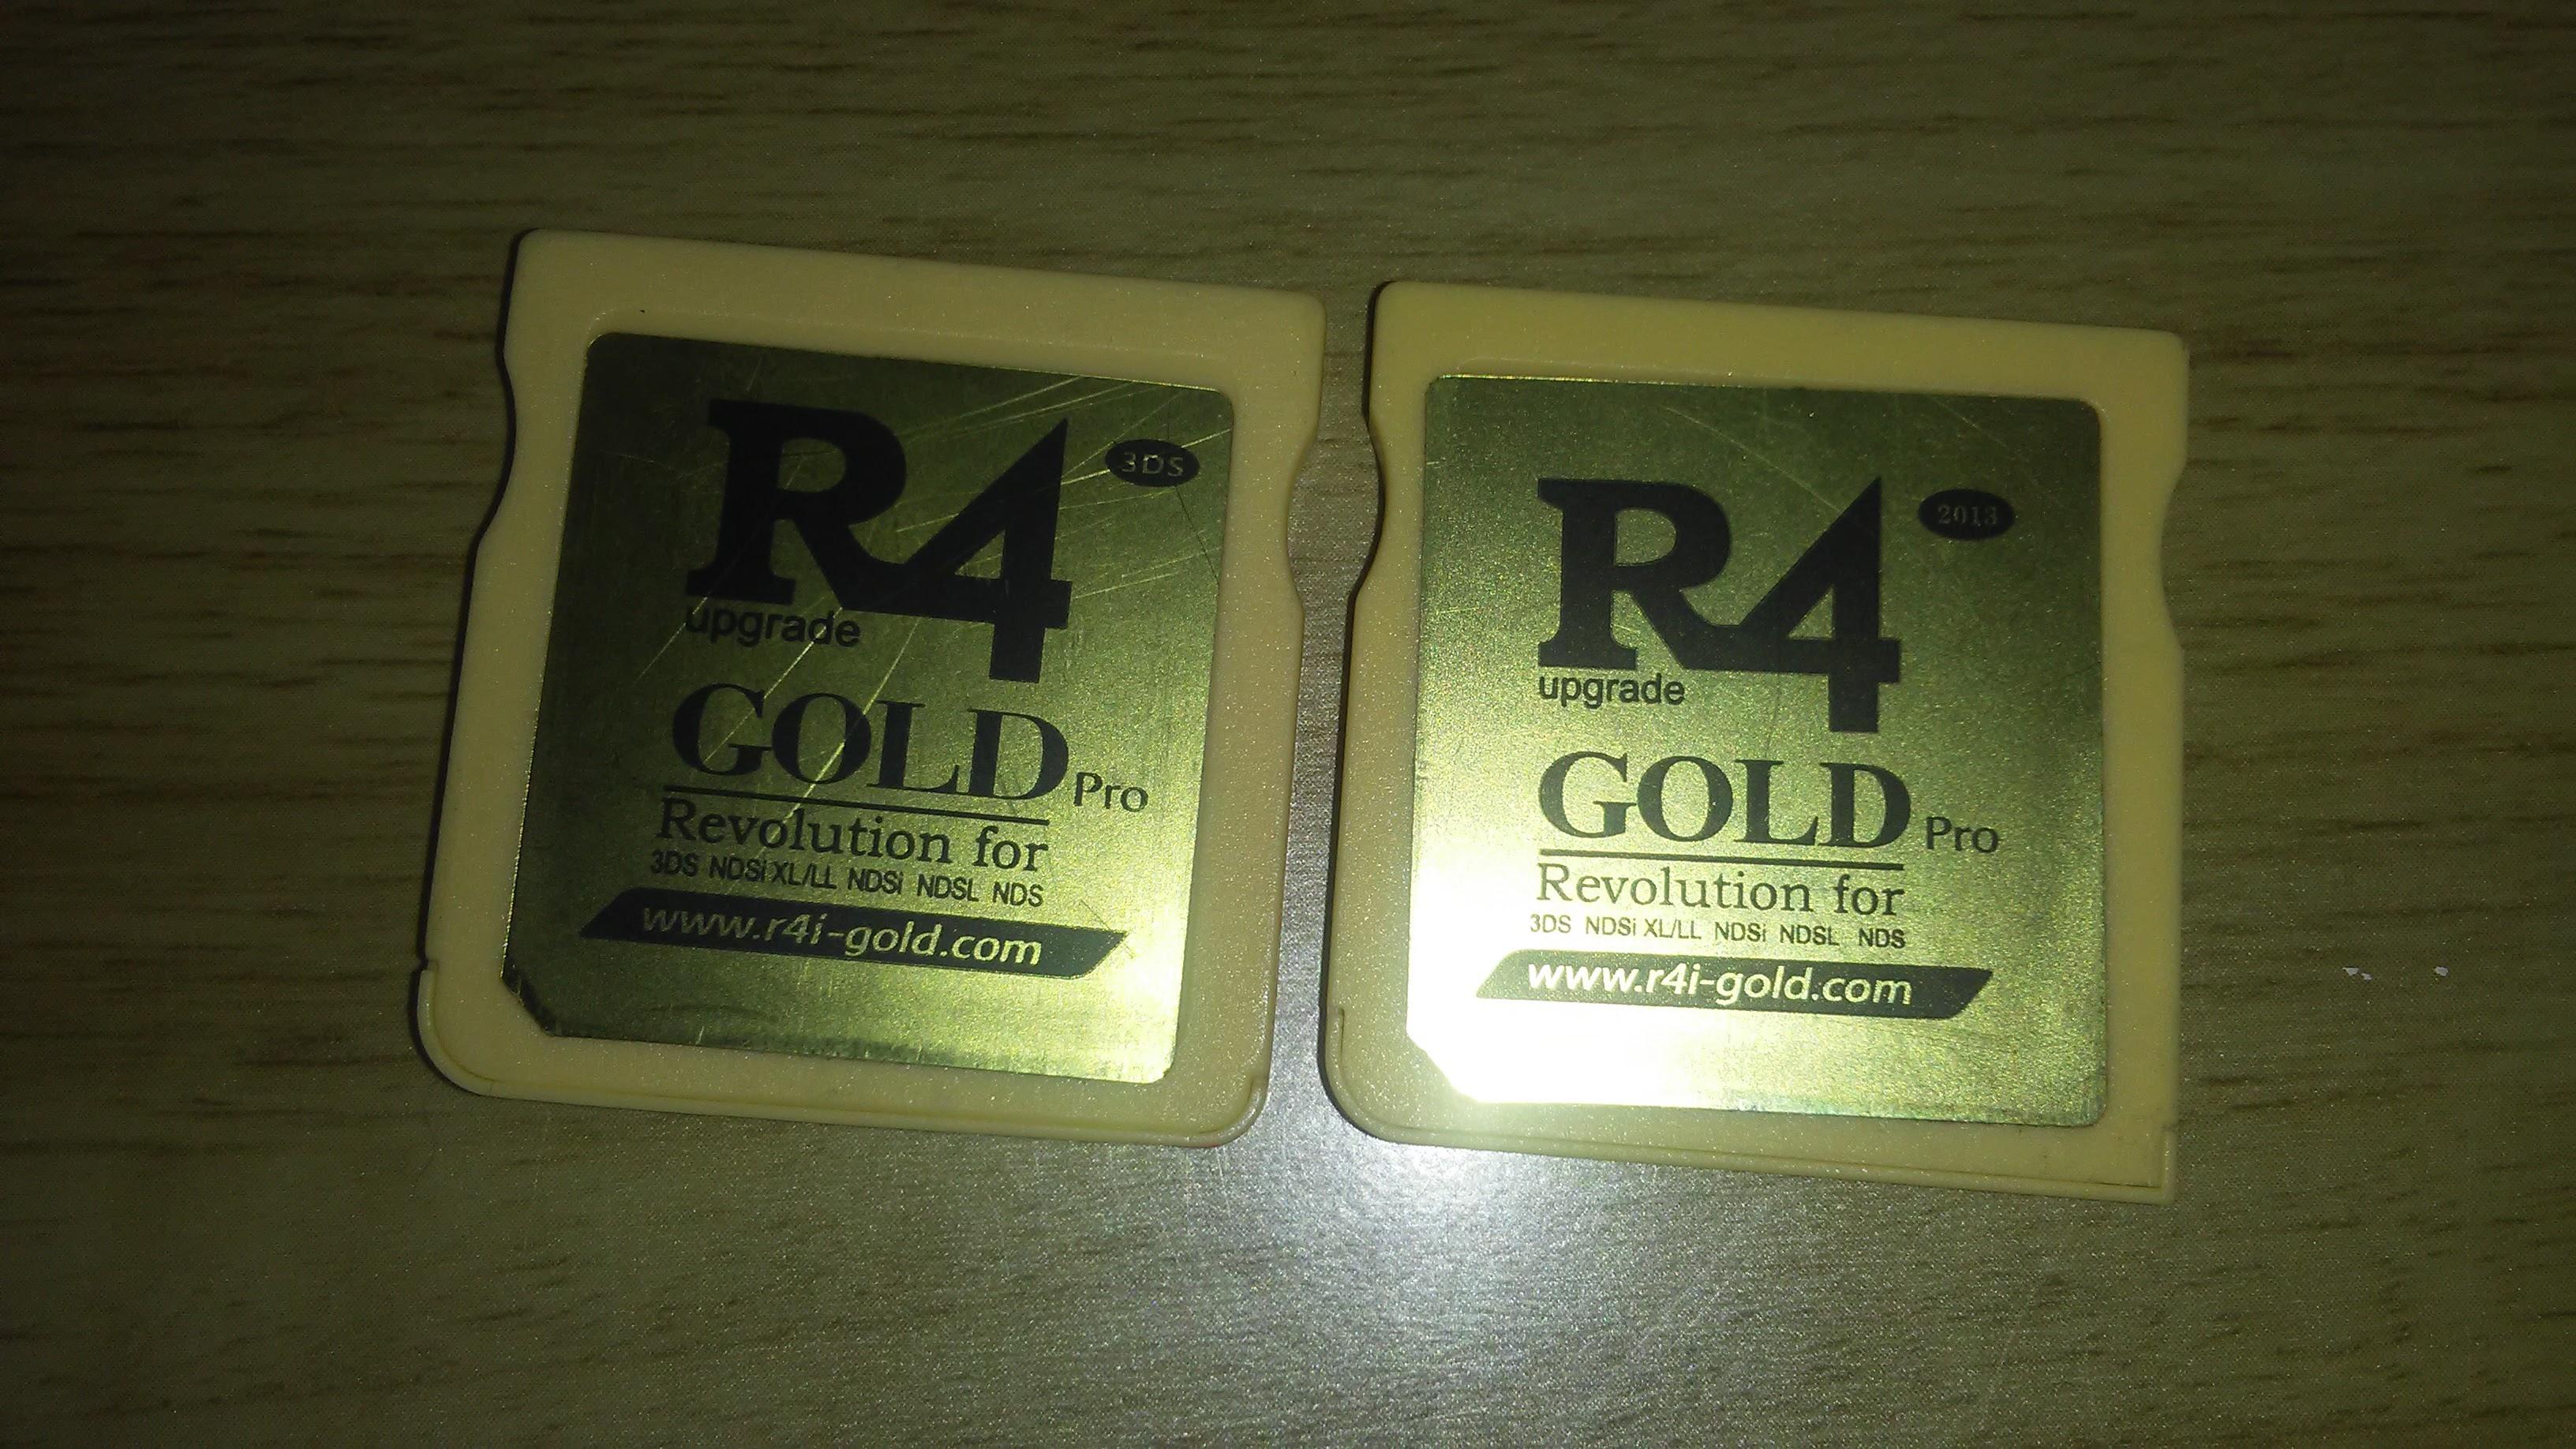 r4 gold pros.